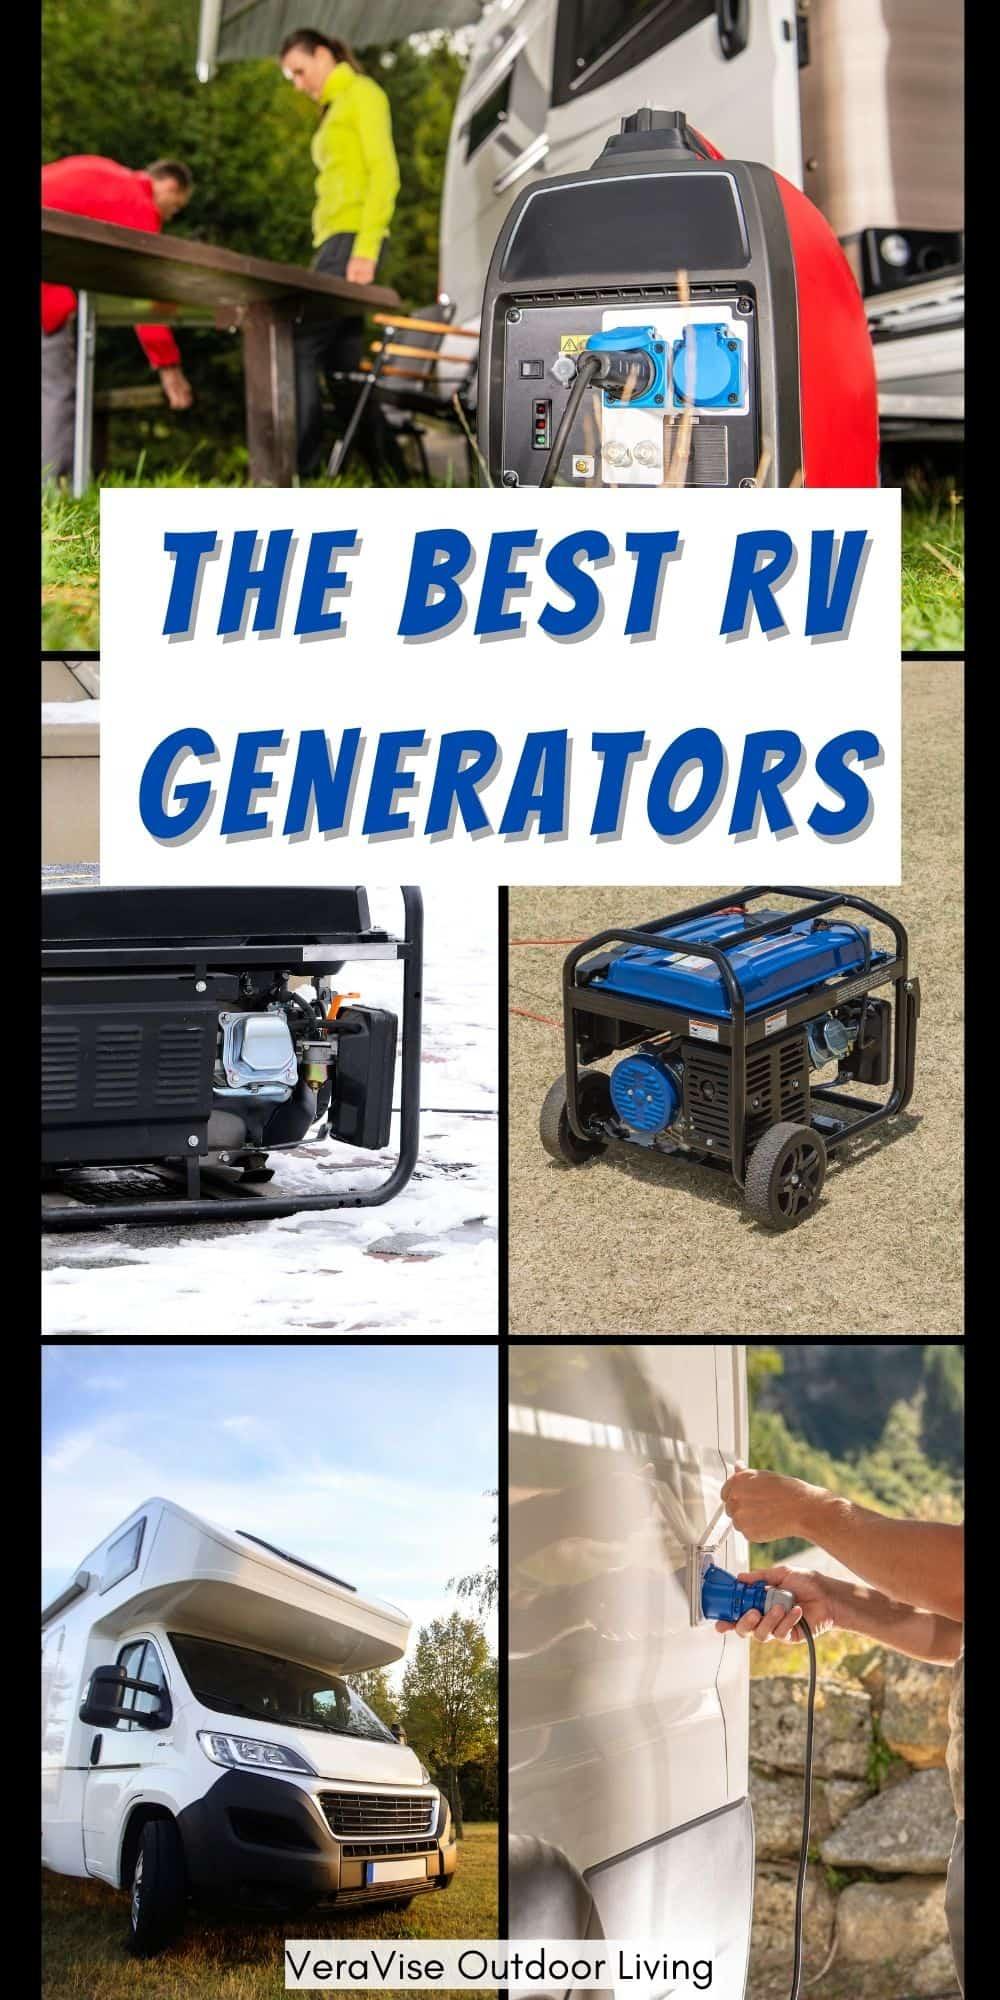 The Best RV Generators